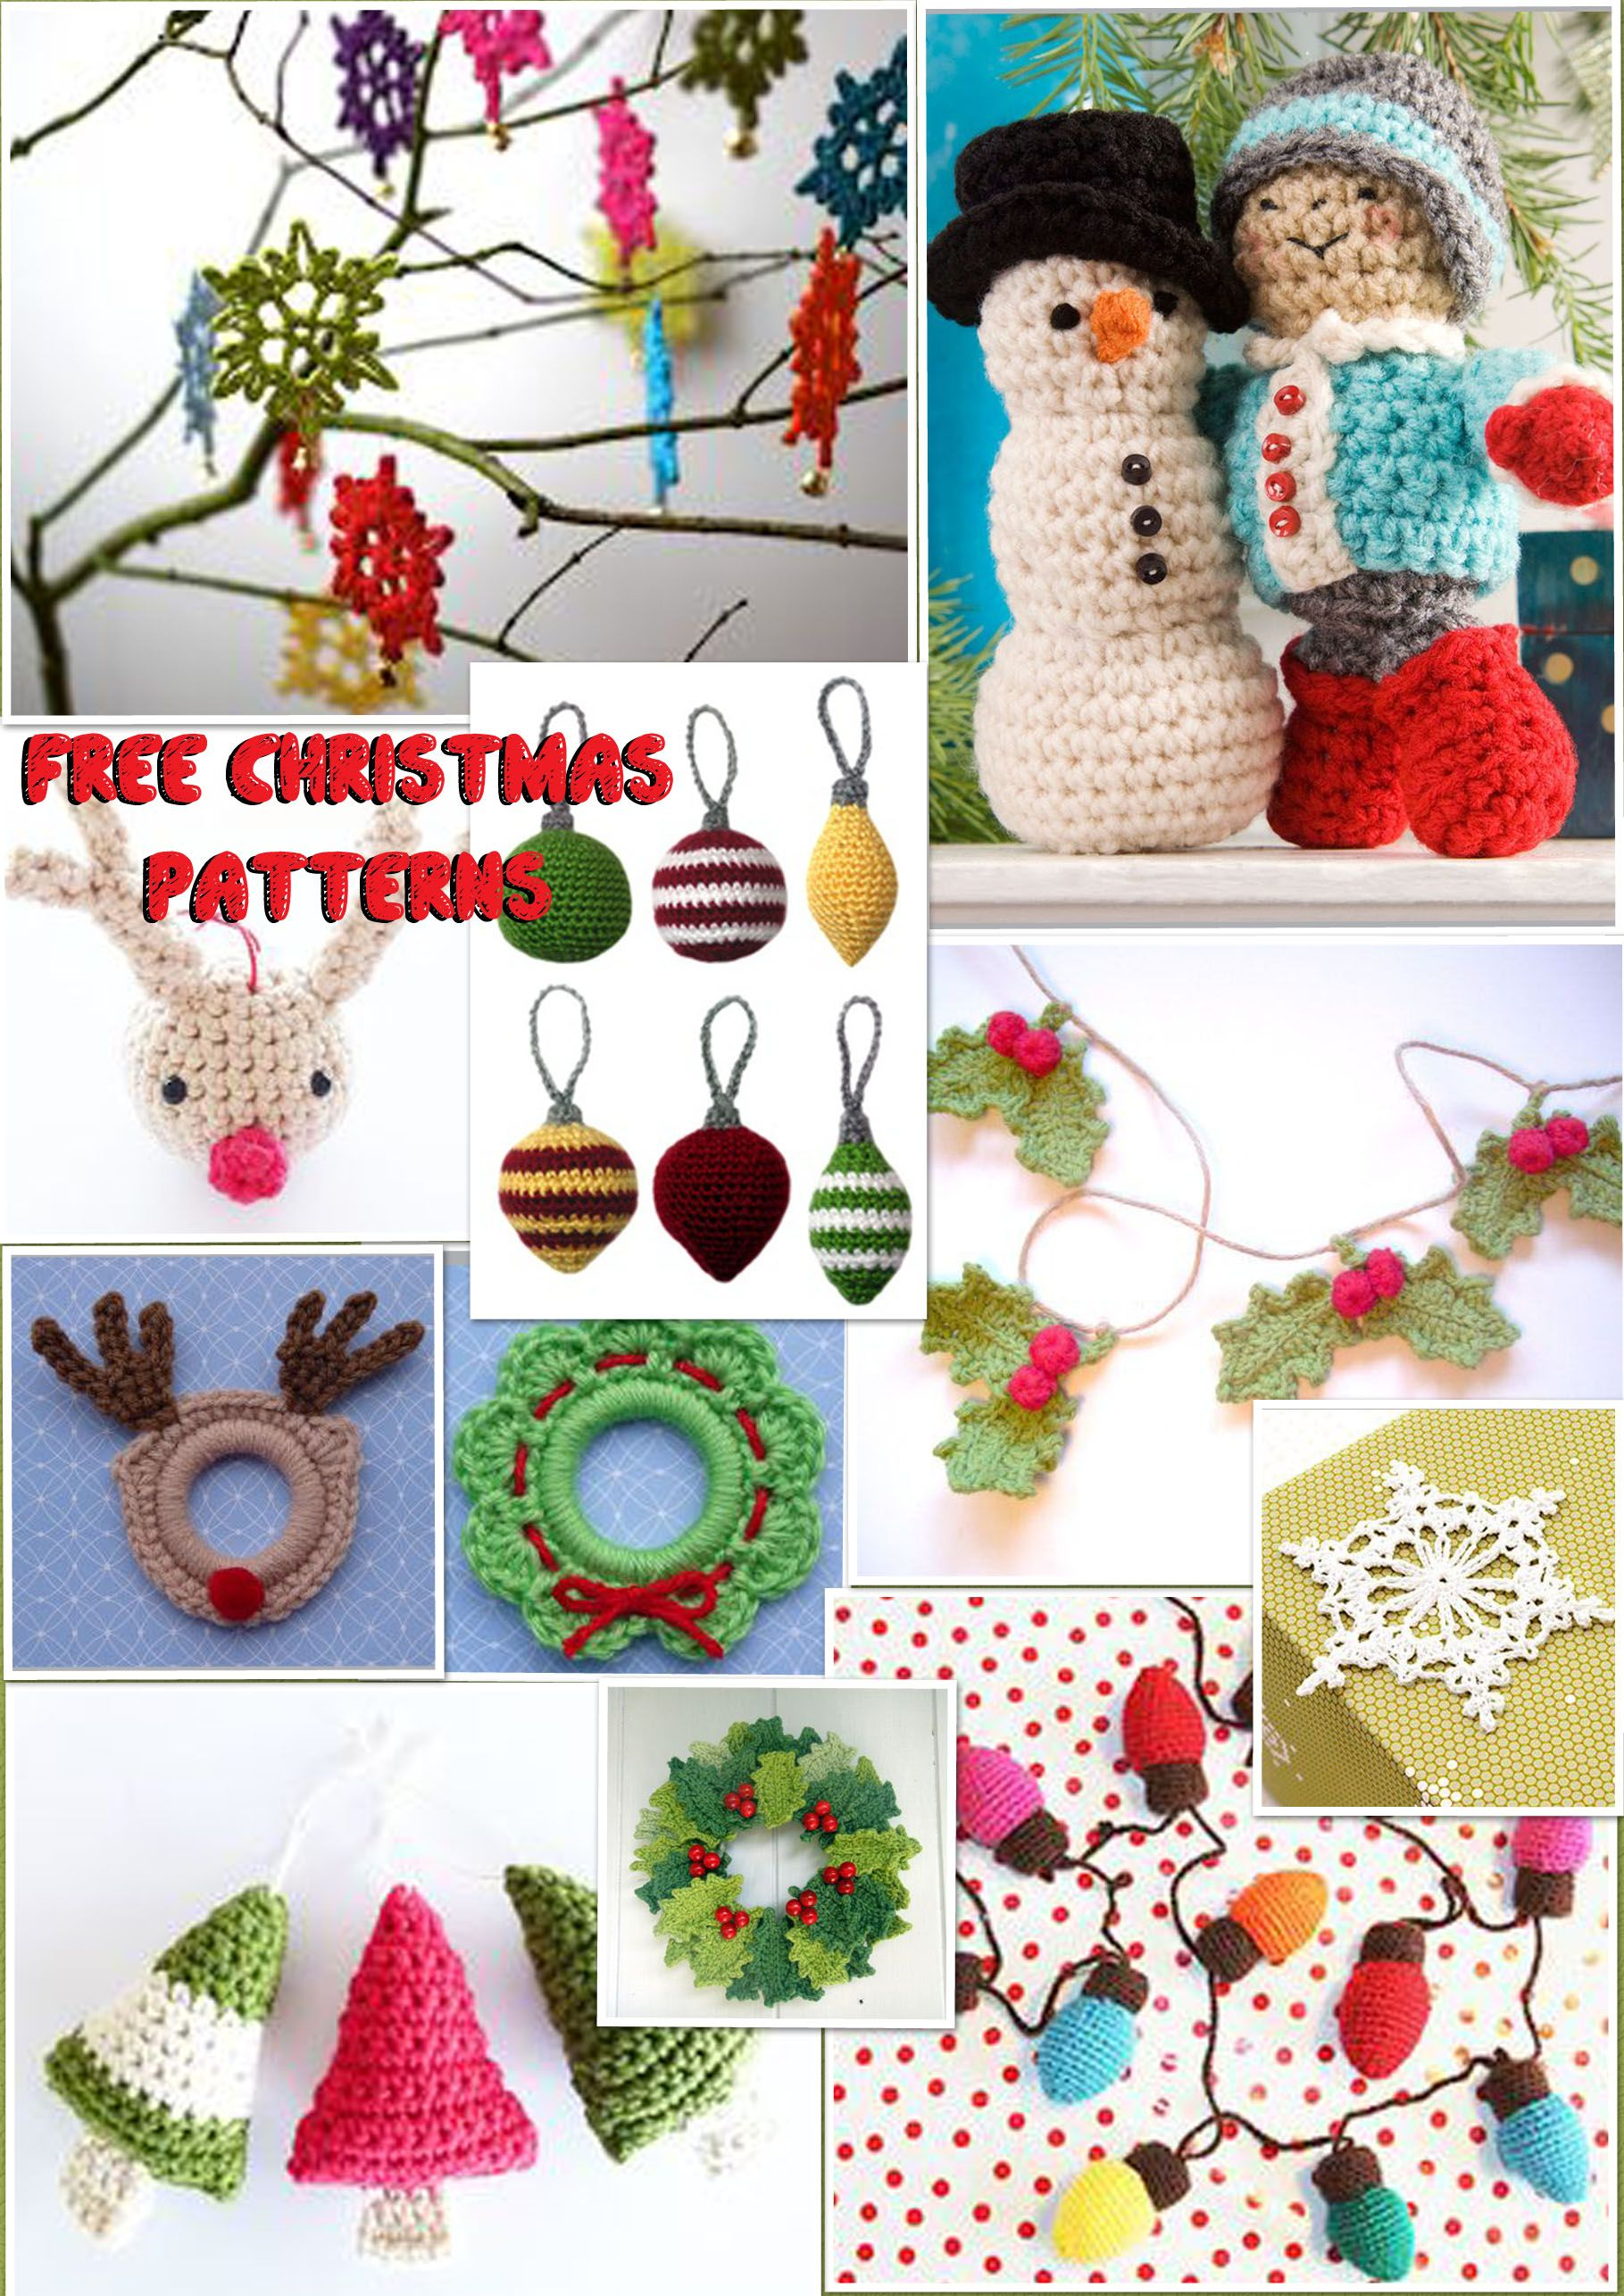 Tis (nearly) the season to be jolly | Weihnachten, Kreativ und Häkeln